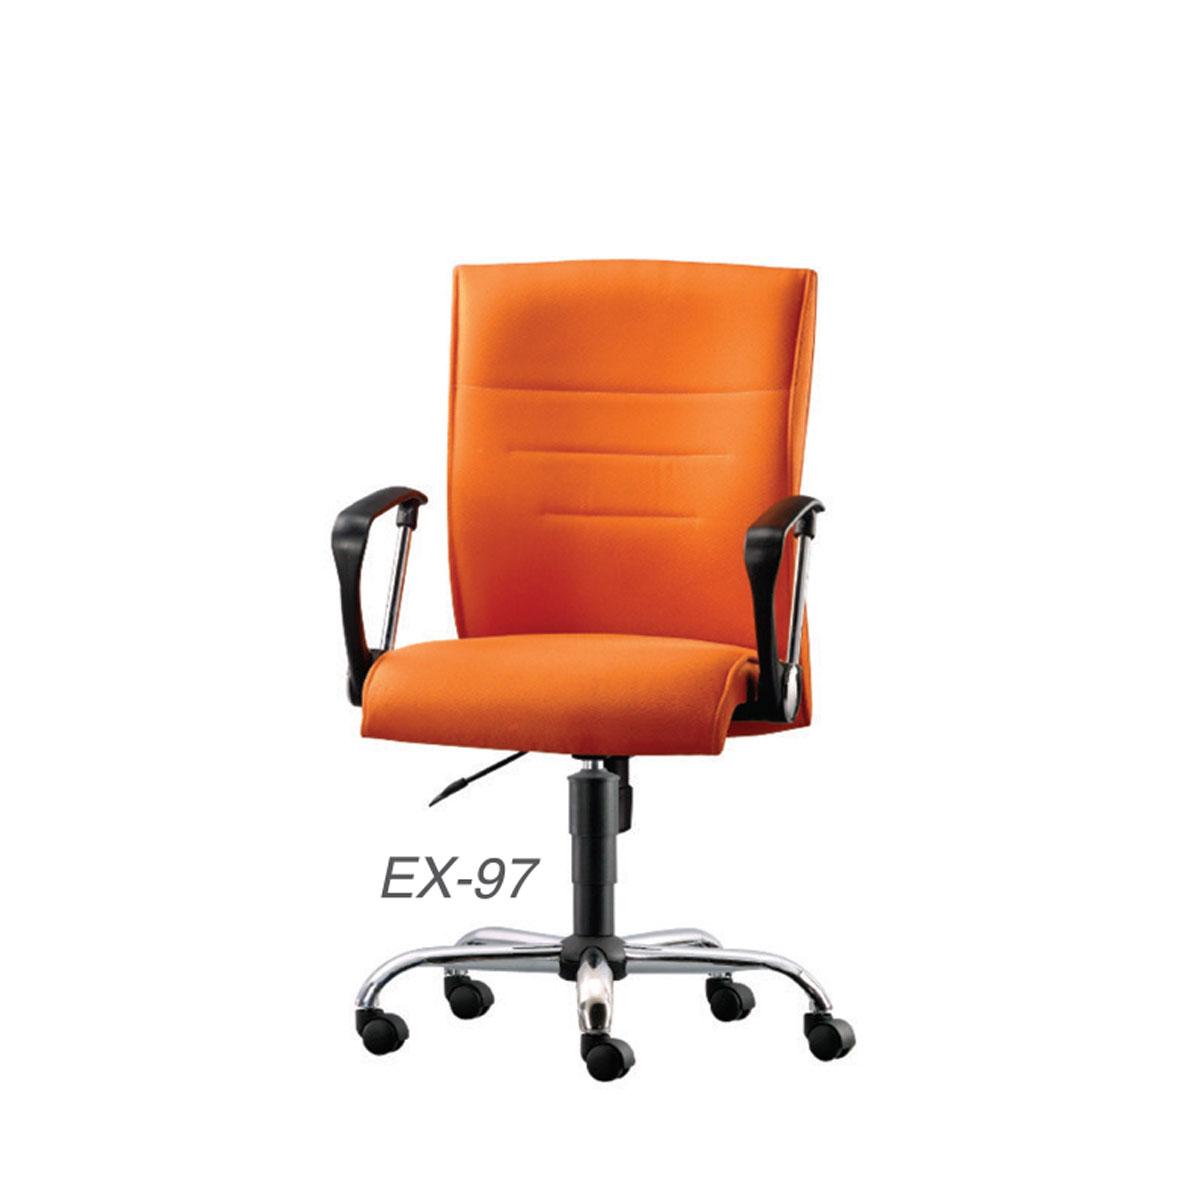 low back chair ex 97. Black Bedroom Furniture Sets. Home Design Ideas